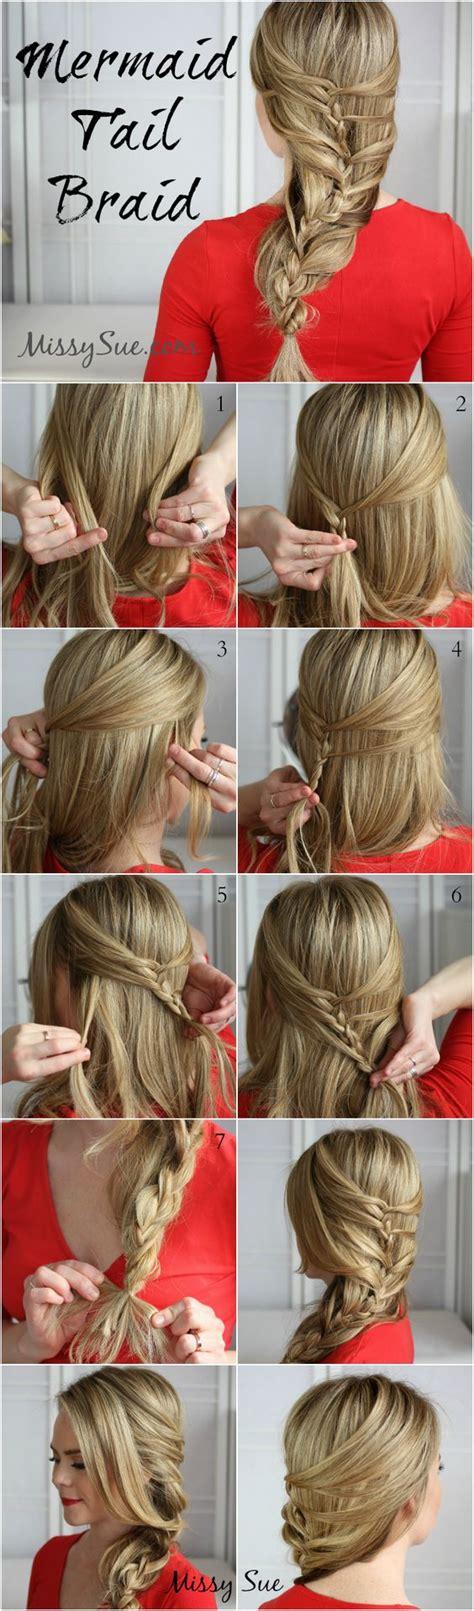 the ultimate mermaid braid step by step instructions 13 step by step hair tutorials to style a mermaid braid